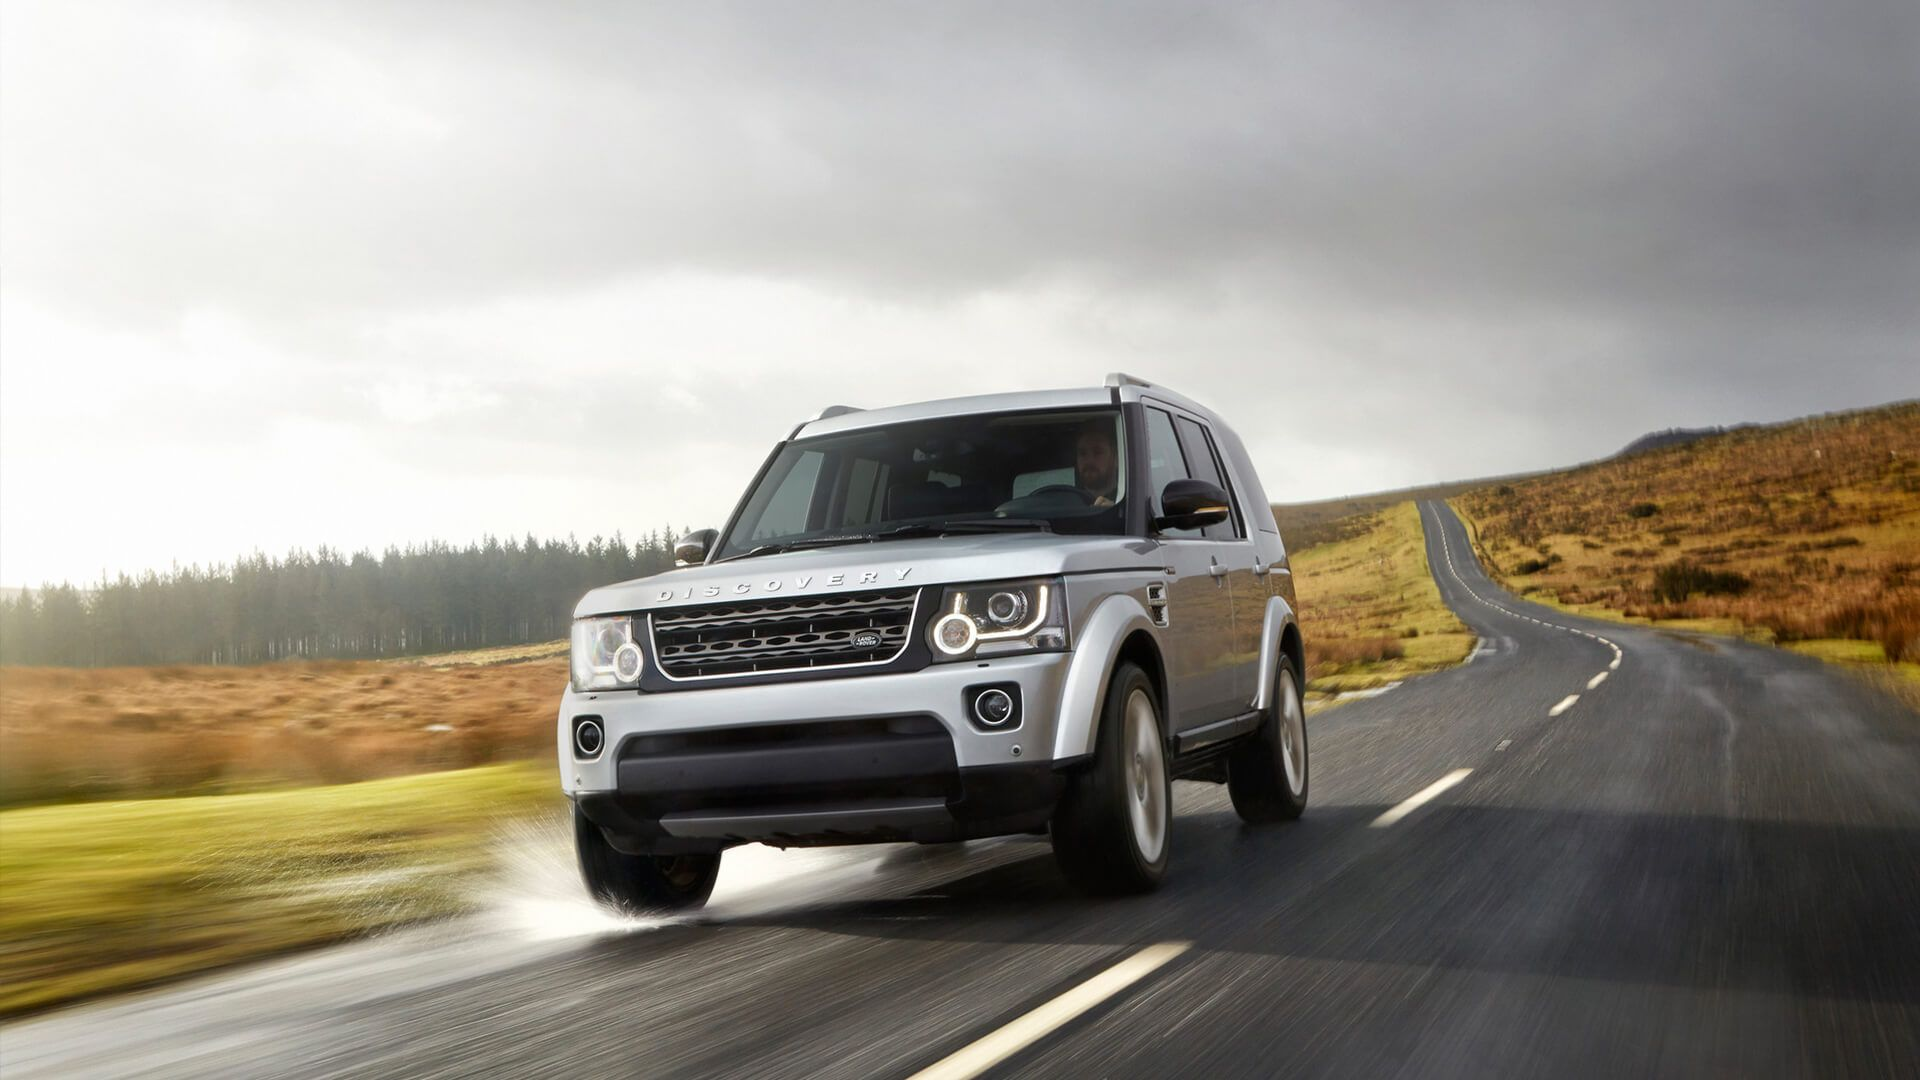 Land Rover Lr4 2016 Best Midsize Luxury Suvs Hd Images Land